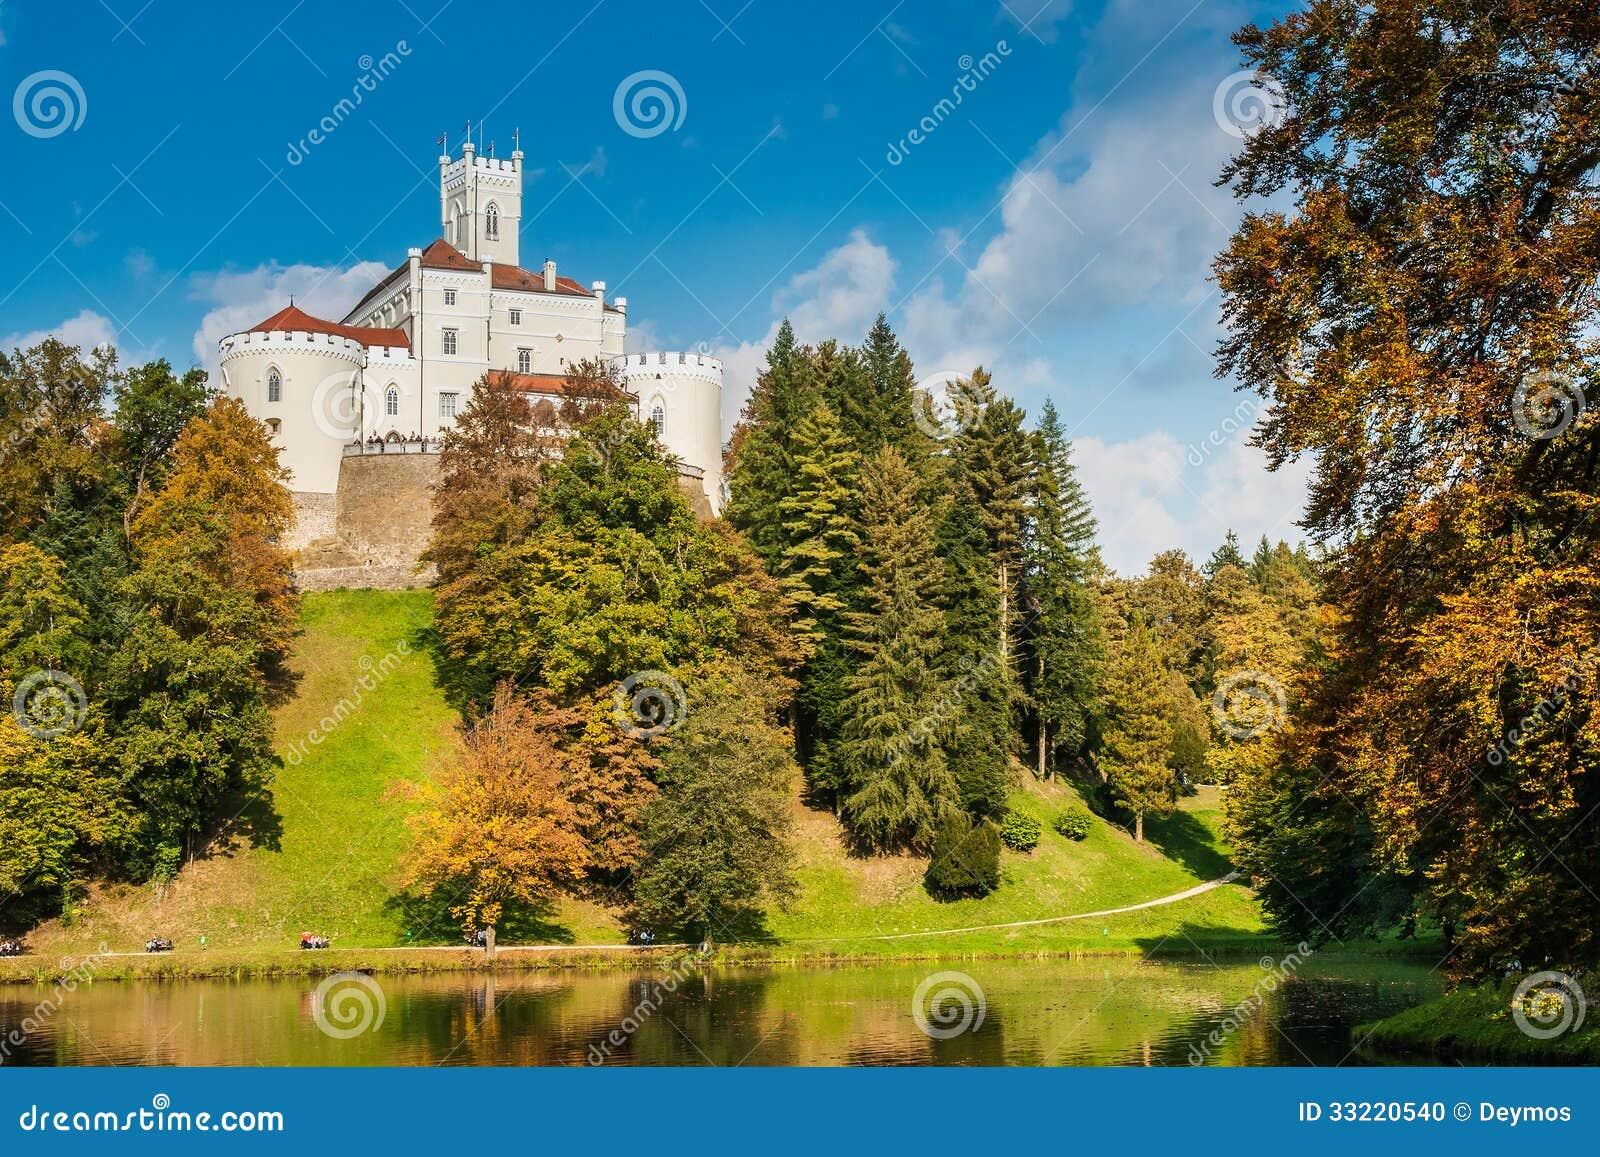 Castle Trakoscan στην Κροατία, που χτίζεται κατά το 1334 ως αριθ. μιας Κροατίας